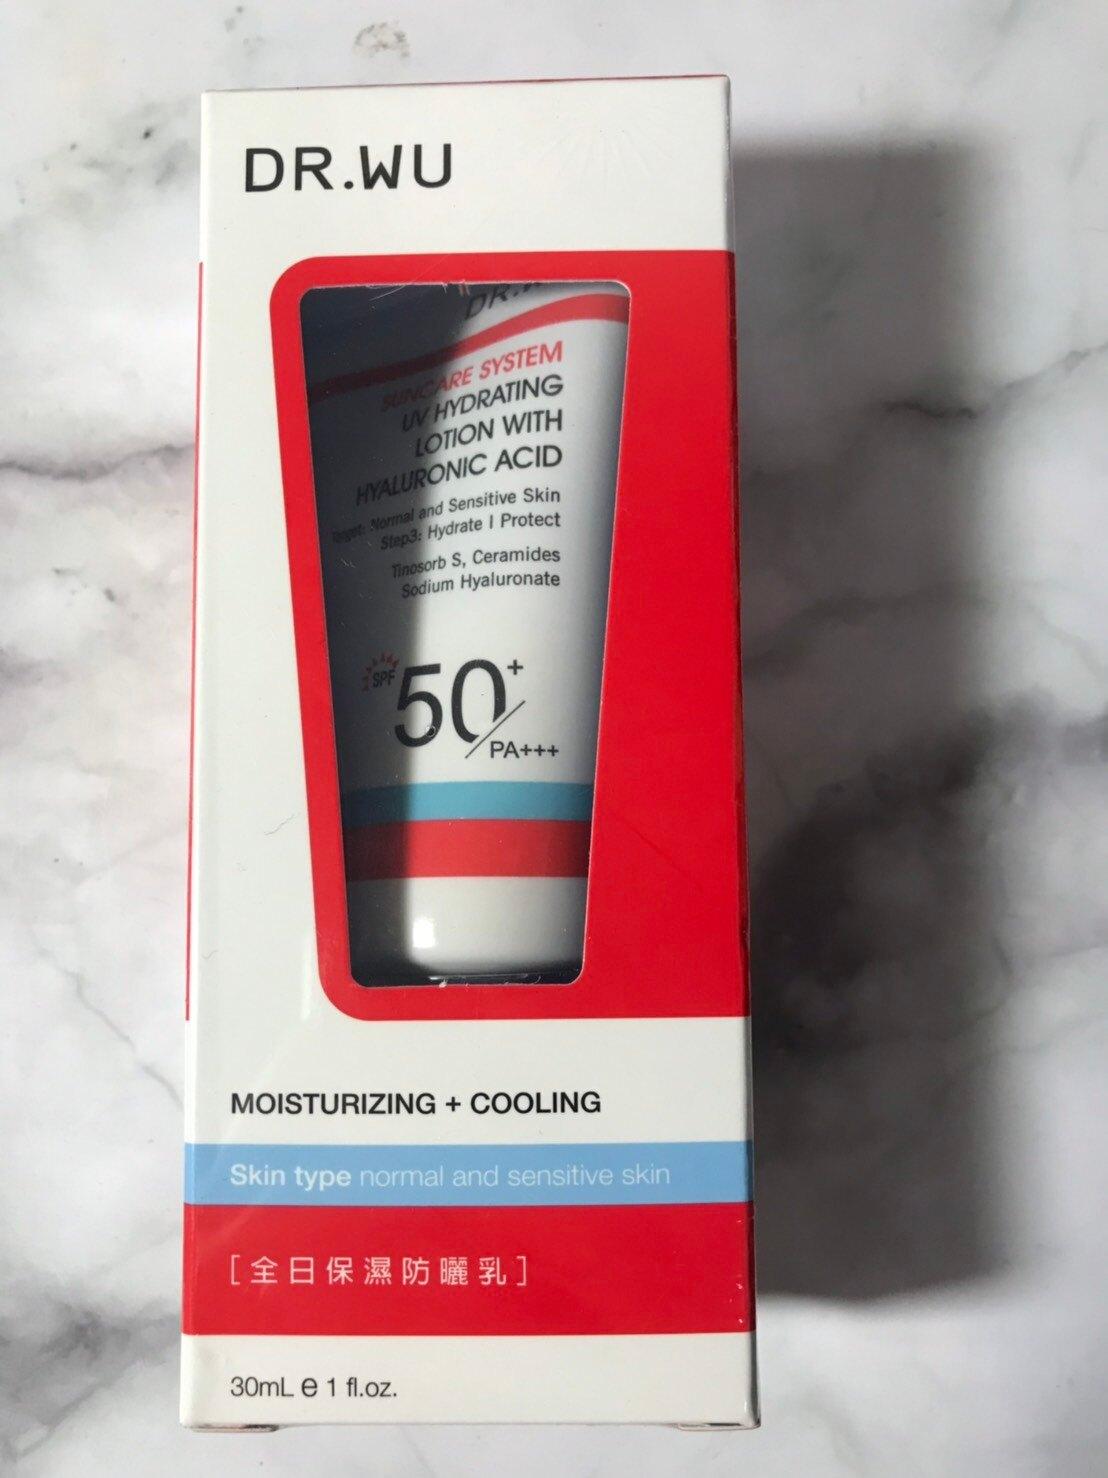 【DR. WU】 全日保濕防曬乳SPF50+-30ML 效期2022.03 可集點【淨妍美肌】